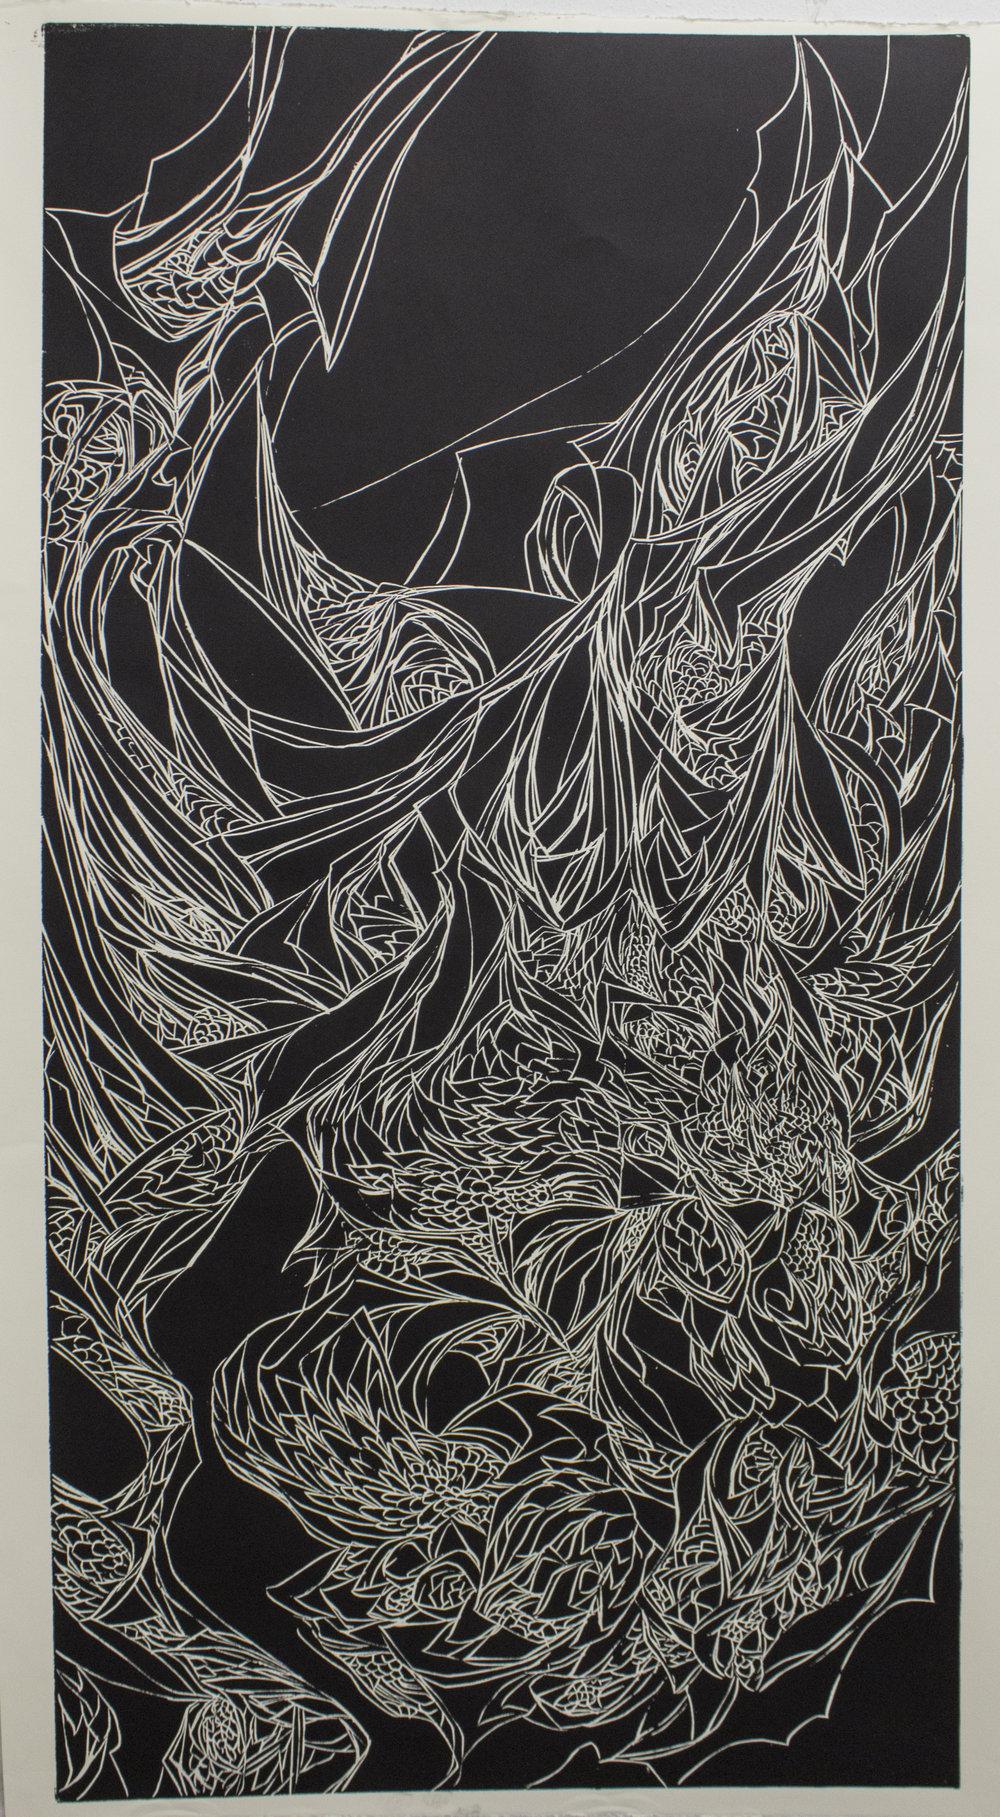 Woodcut 4' x 2' 2016